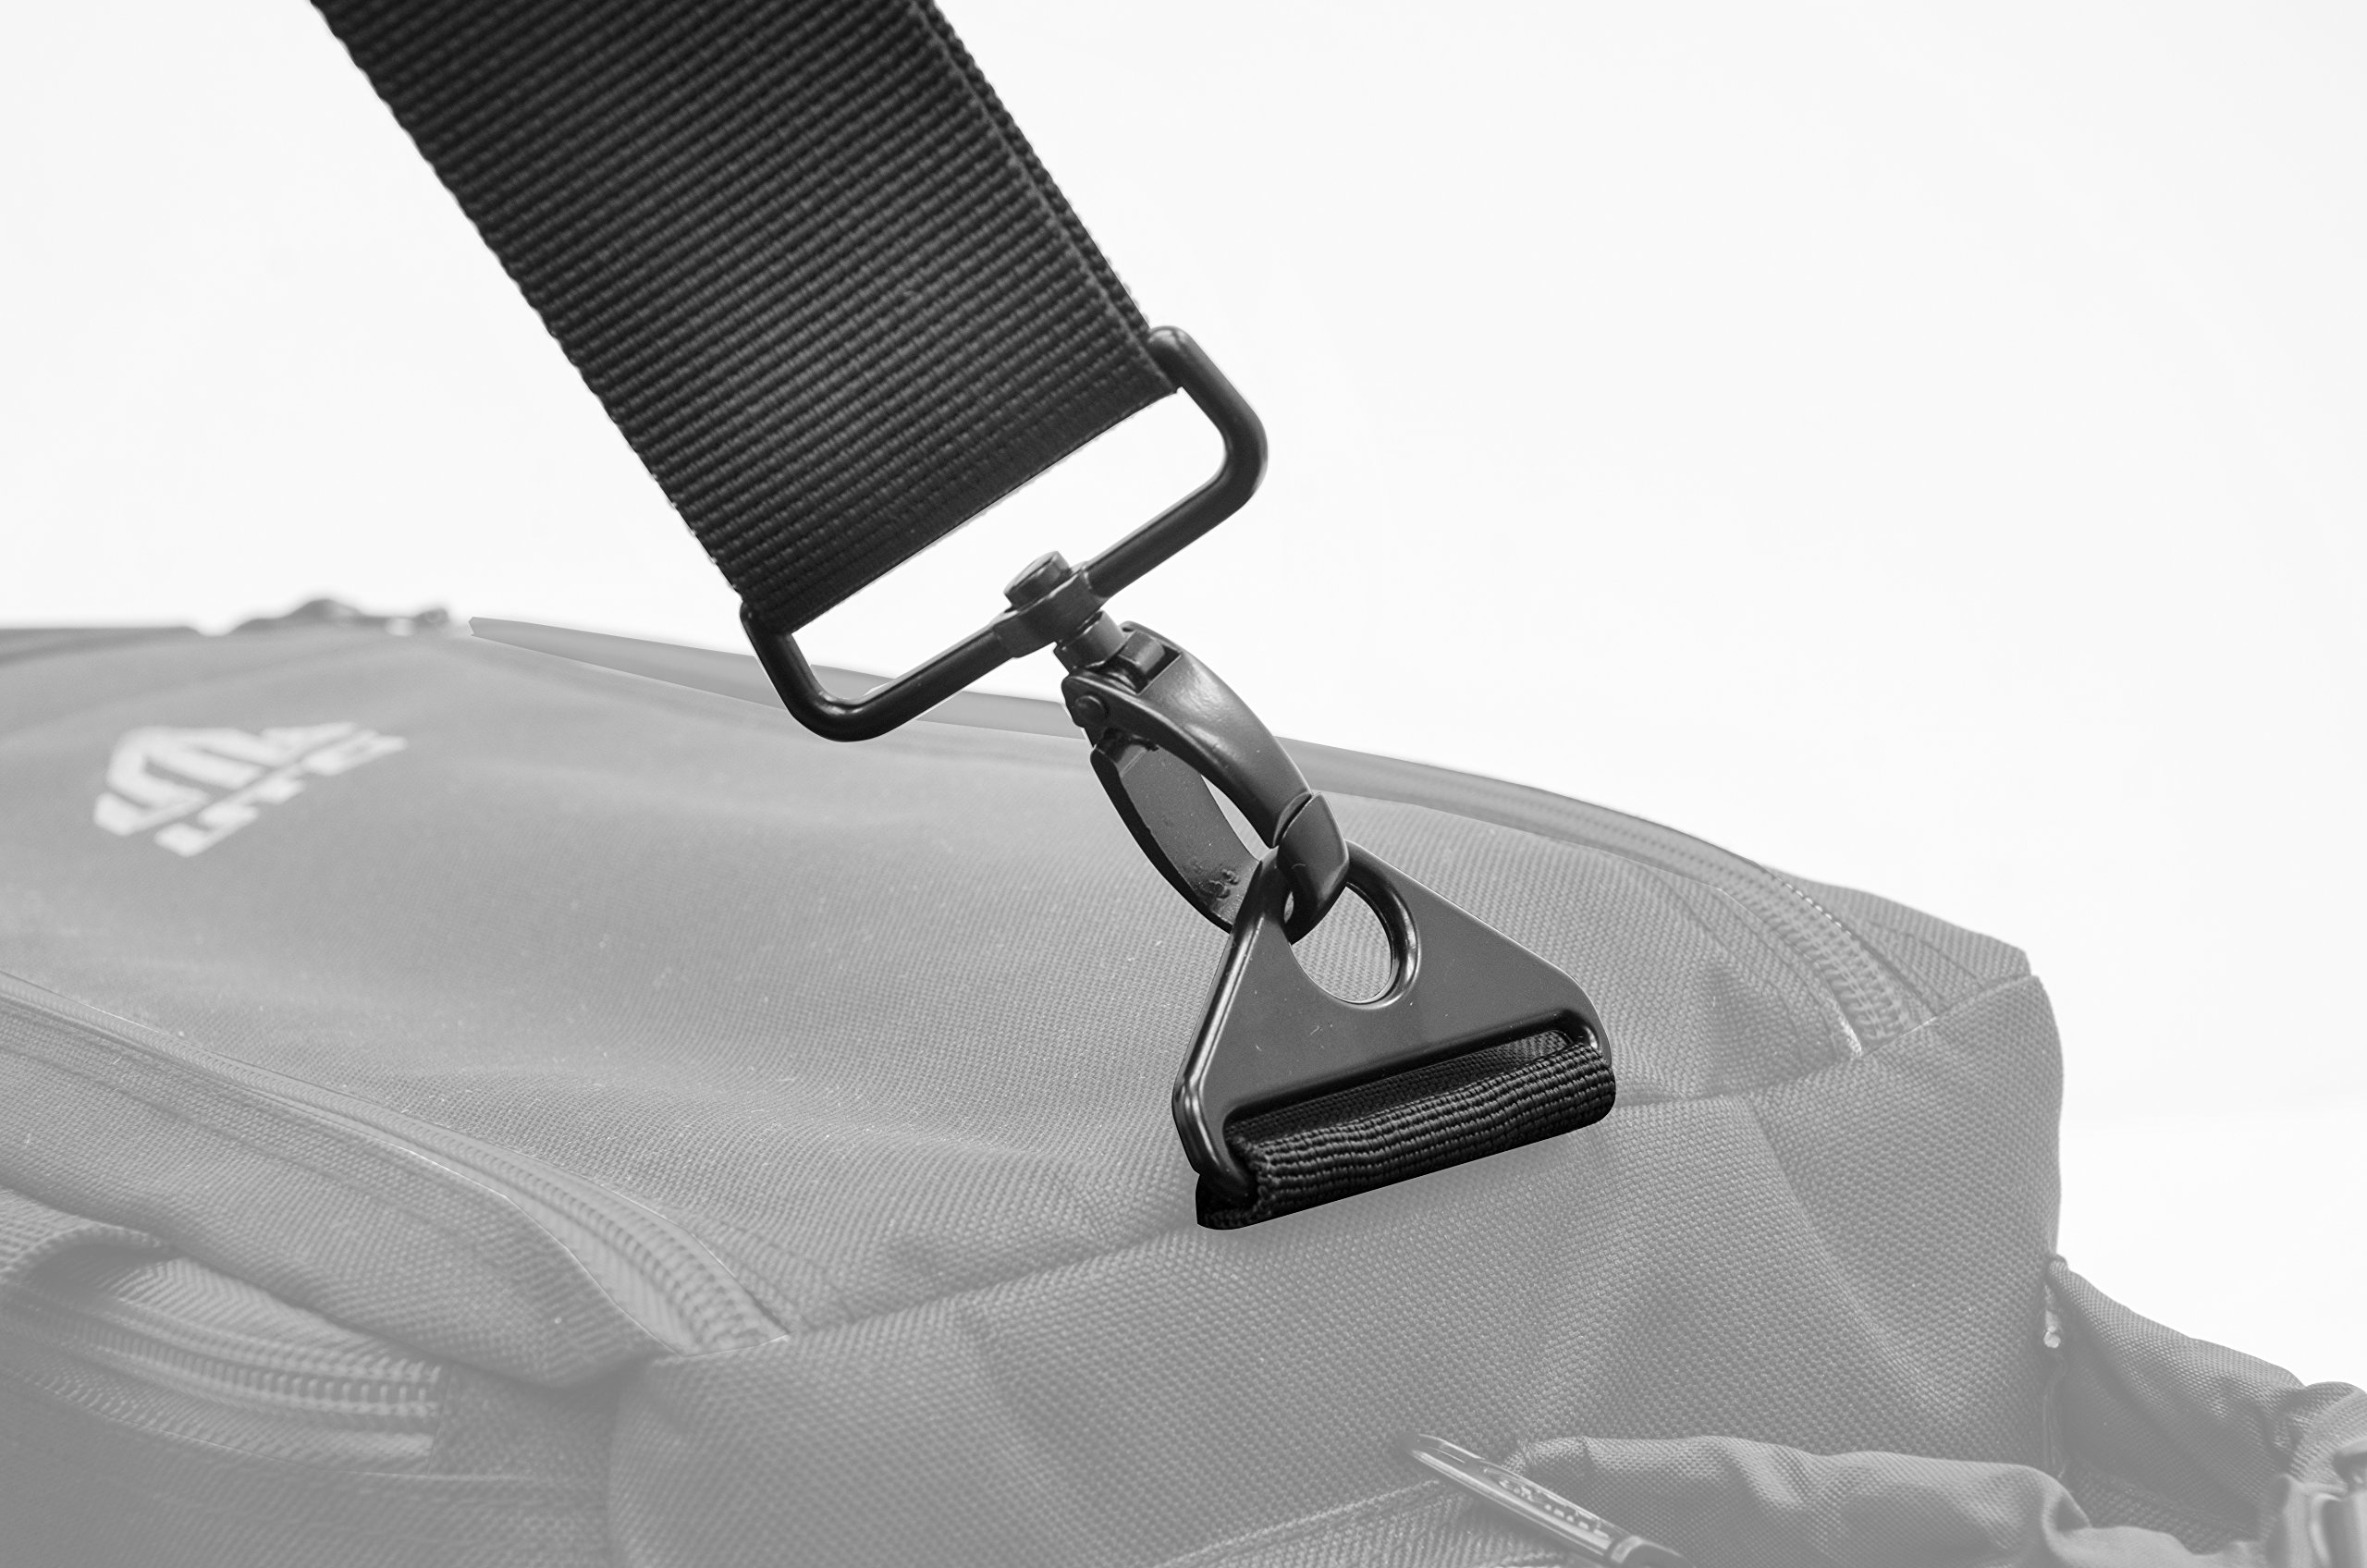 UTG All in One Range/Utility Go Bag, Black/Violet, 21'' x 10'' x 9'' by UTG (Image #11)